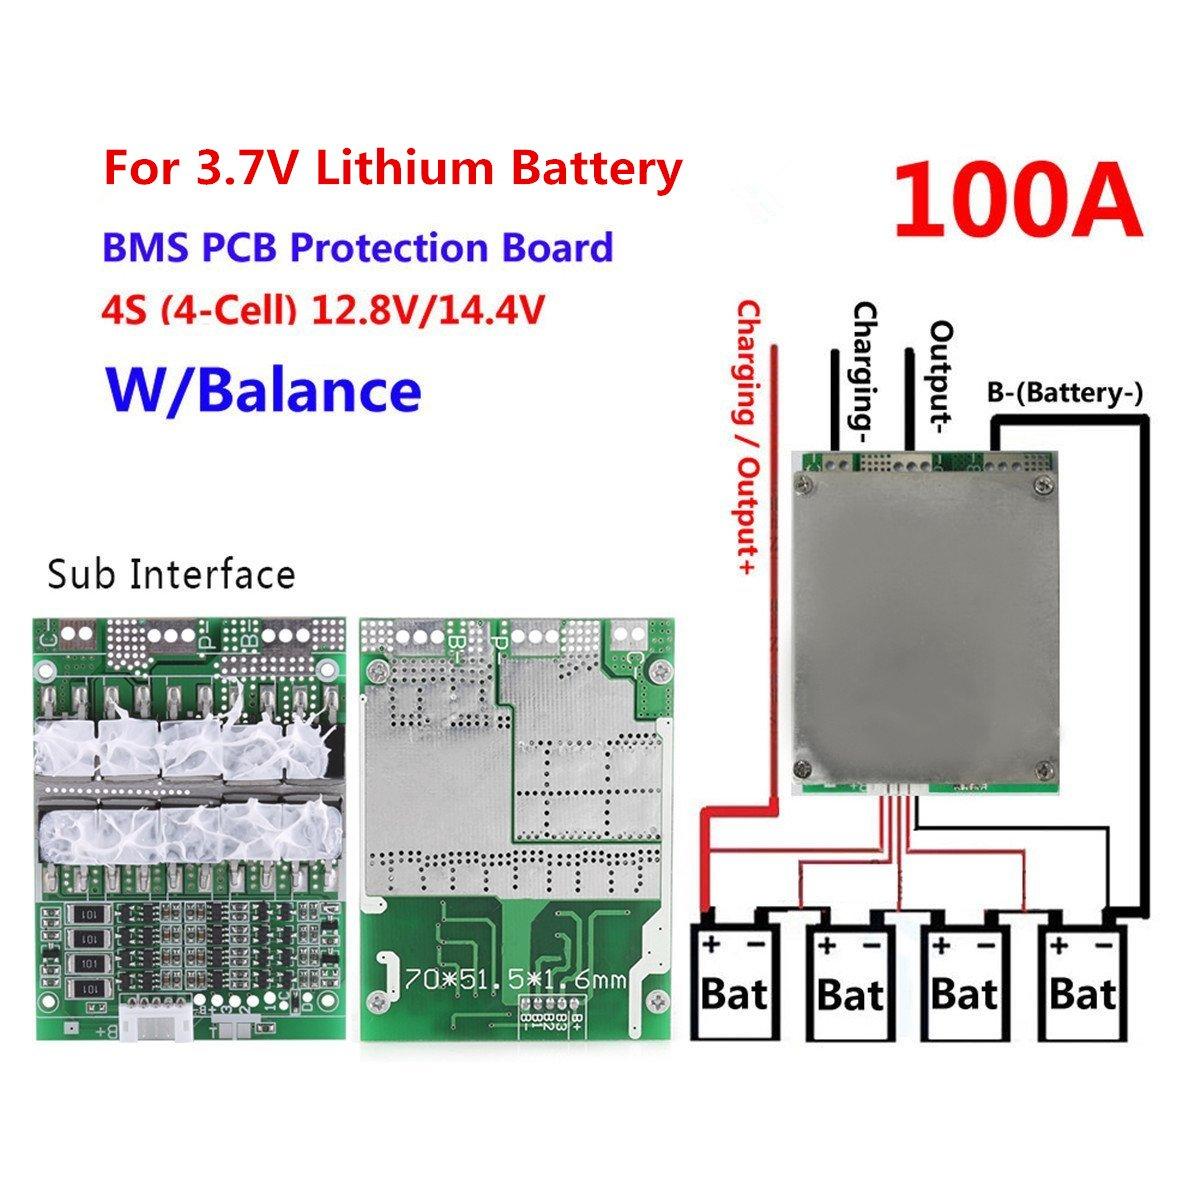 Miraculous Amazon Com Knacro 3 7V 4S 100A 12V W Balance Lithium Battery Bms Wiring Cloud Filiciilluminateatxorg